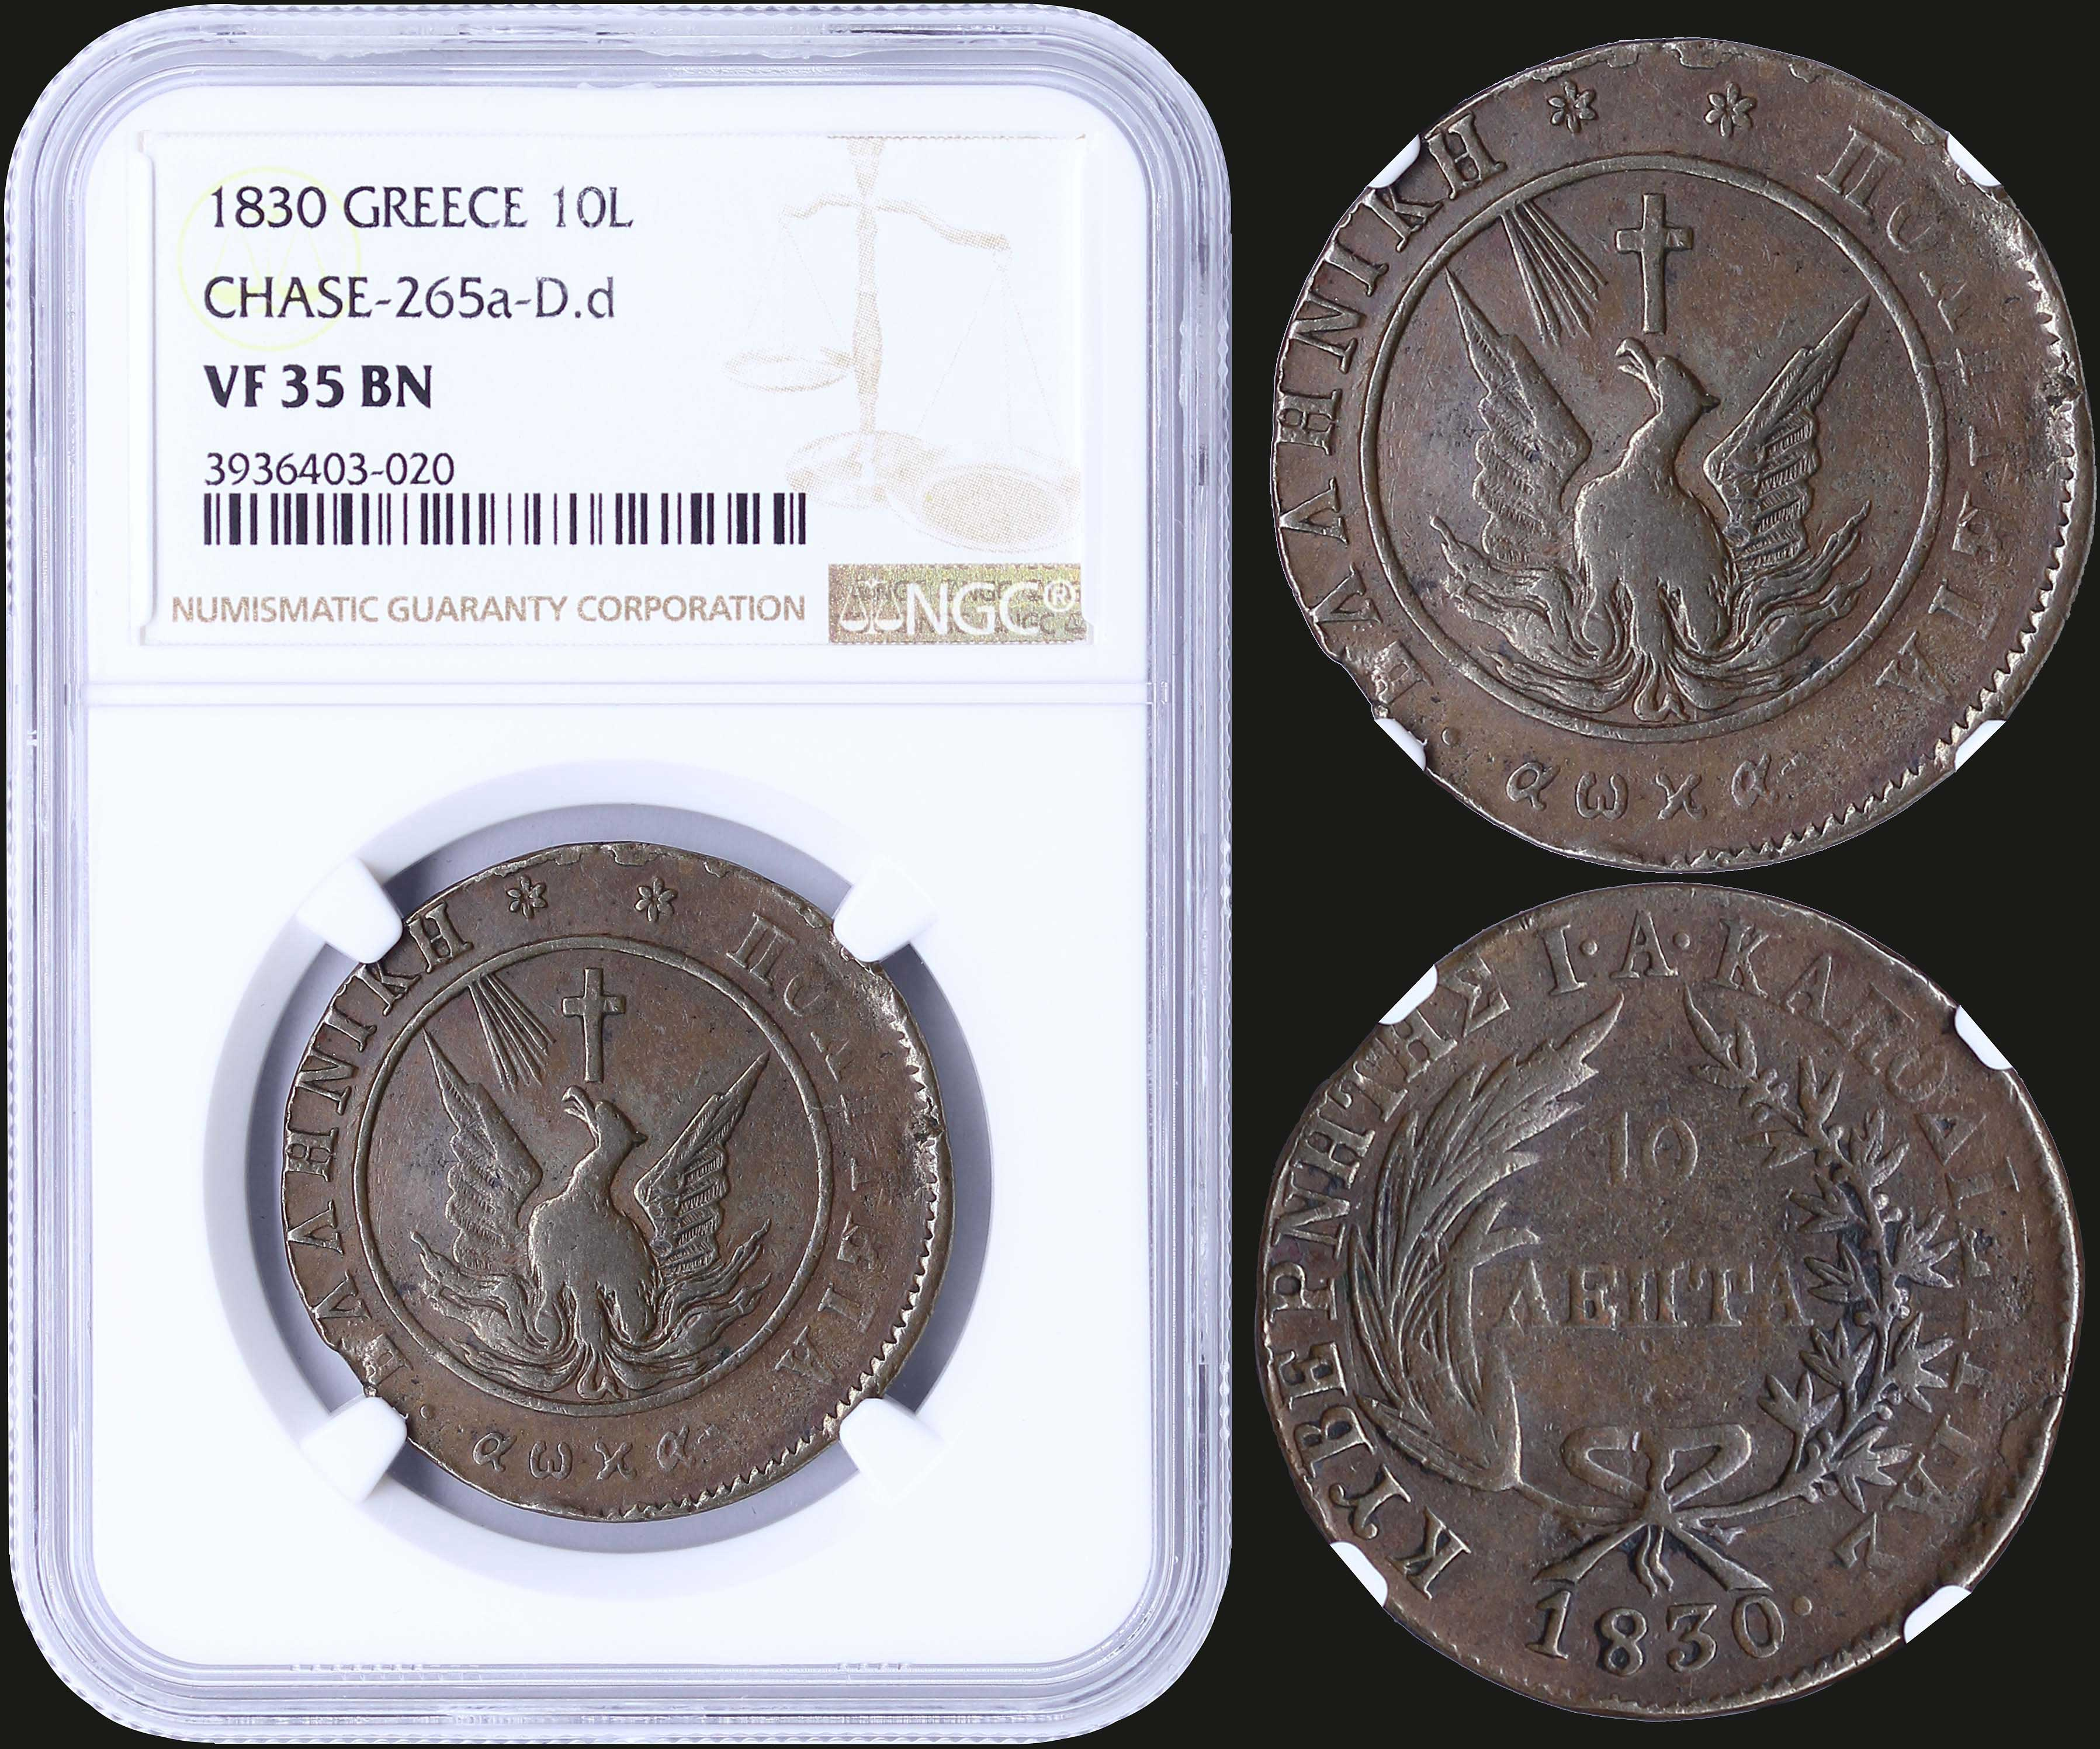 Lot 6024 - -  COINS & TOKENS governor capodistrias -  A. Karamitsos Public & Live Bid Auction 636 Coins, Medals & Banknotes